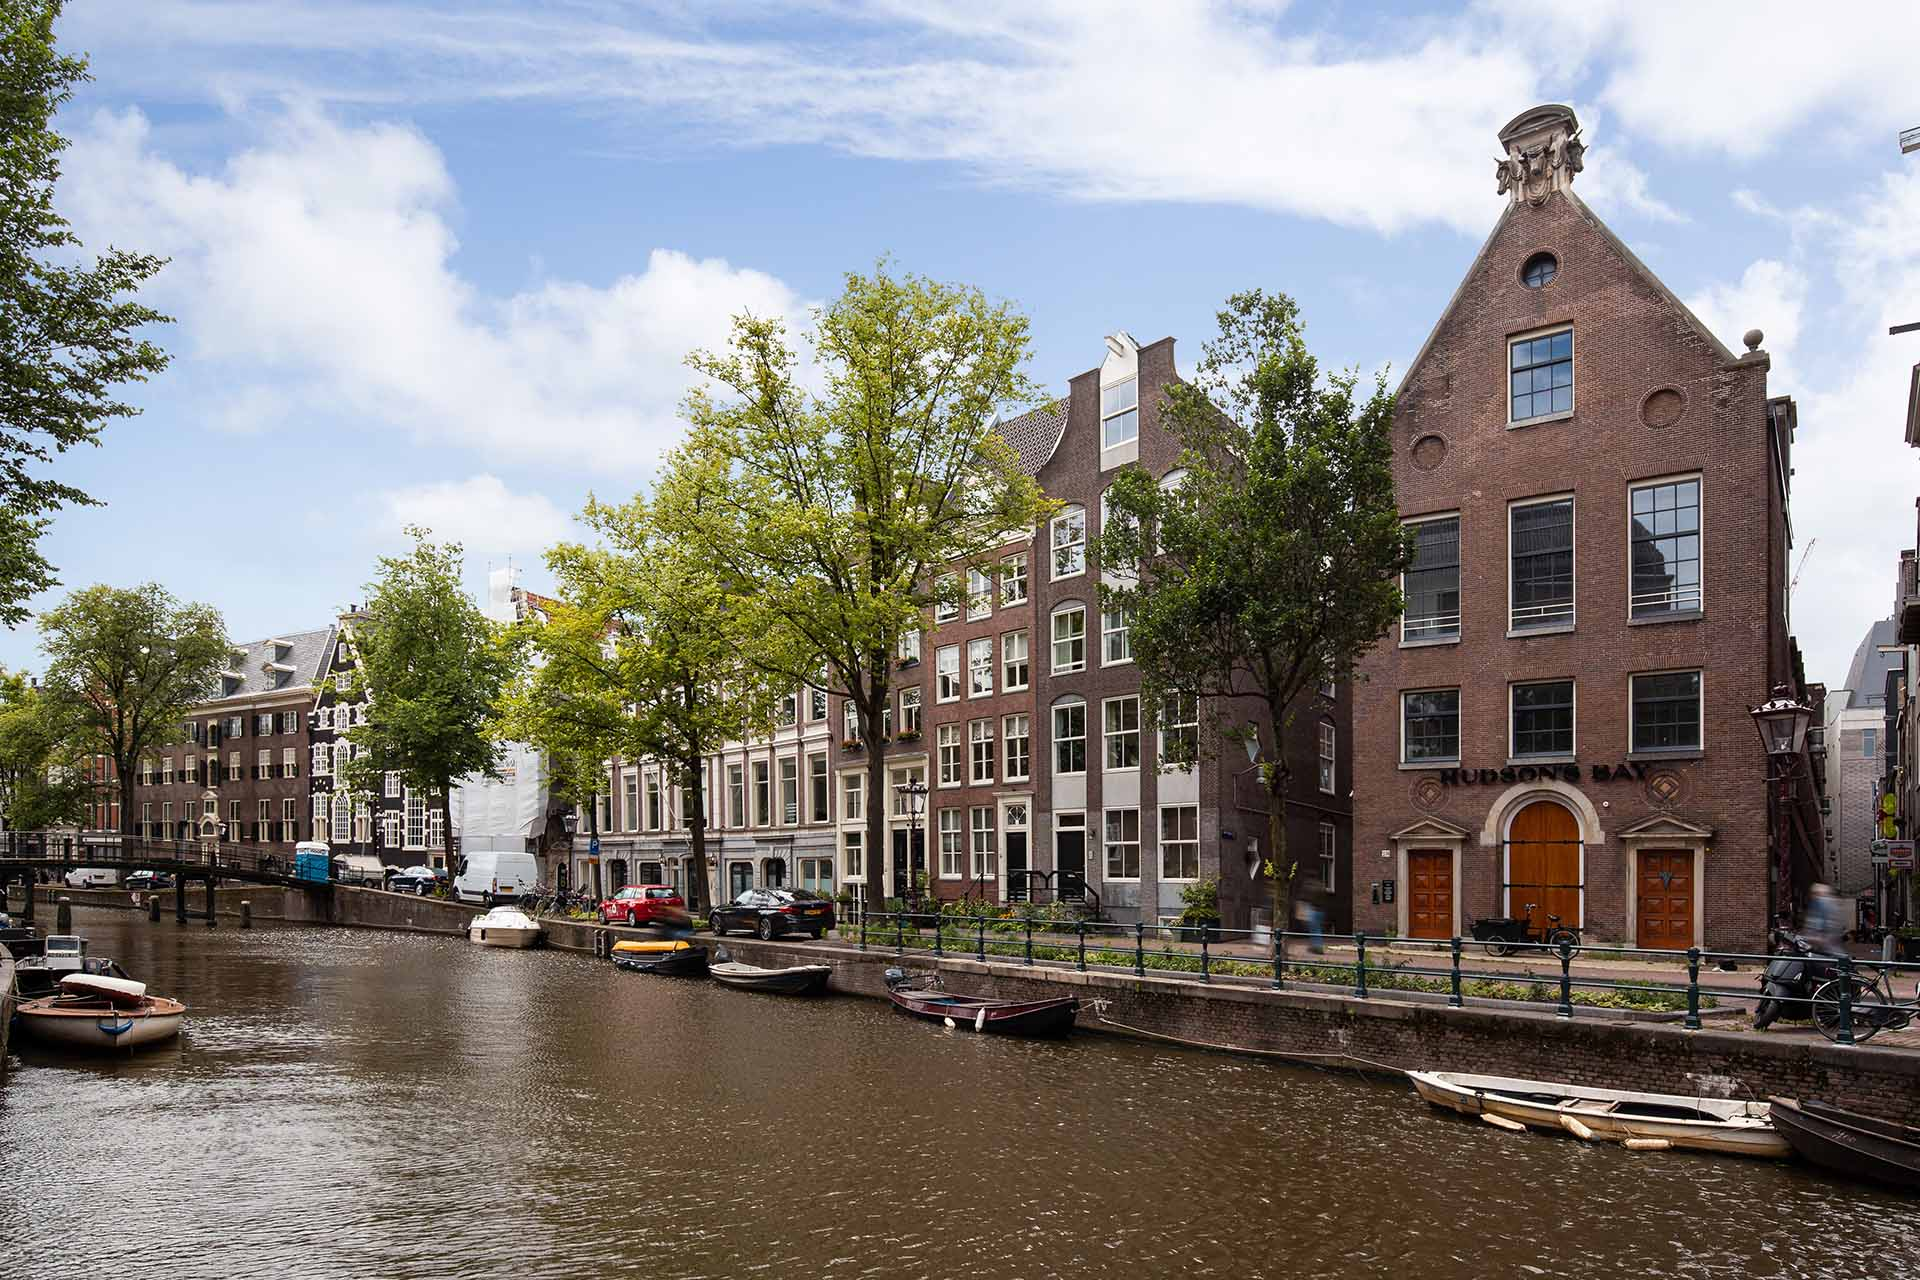 Vleeshal, Amsterdam Rokin, NL (1)